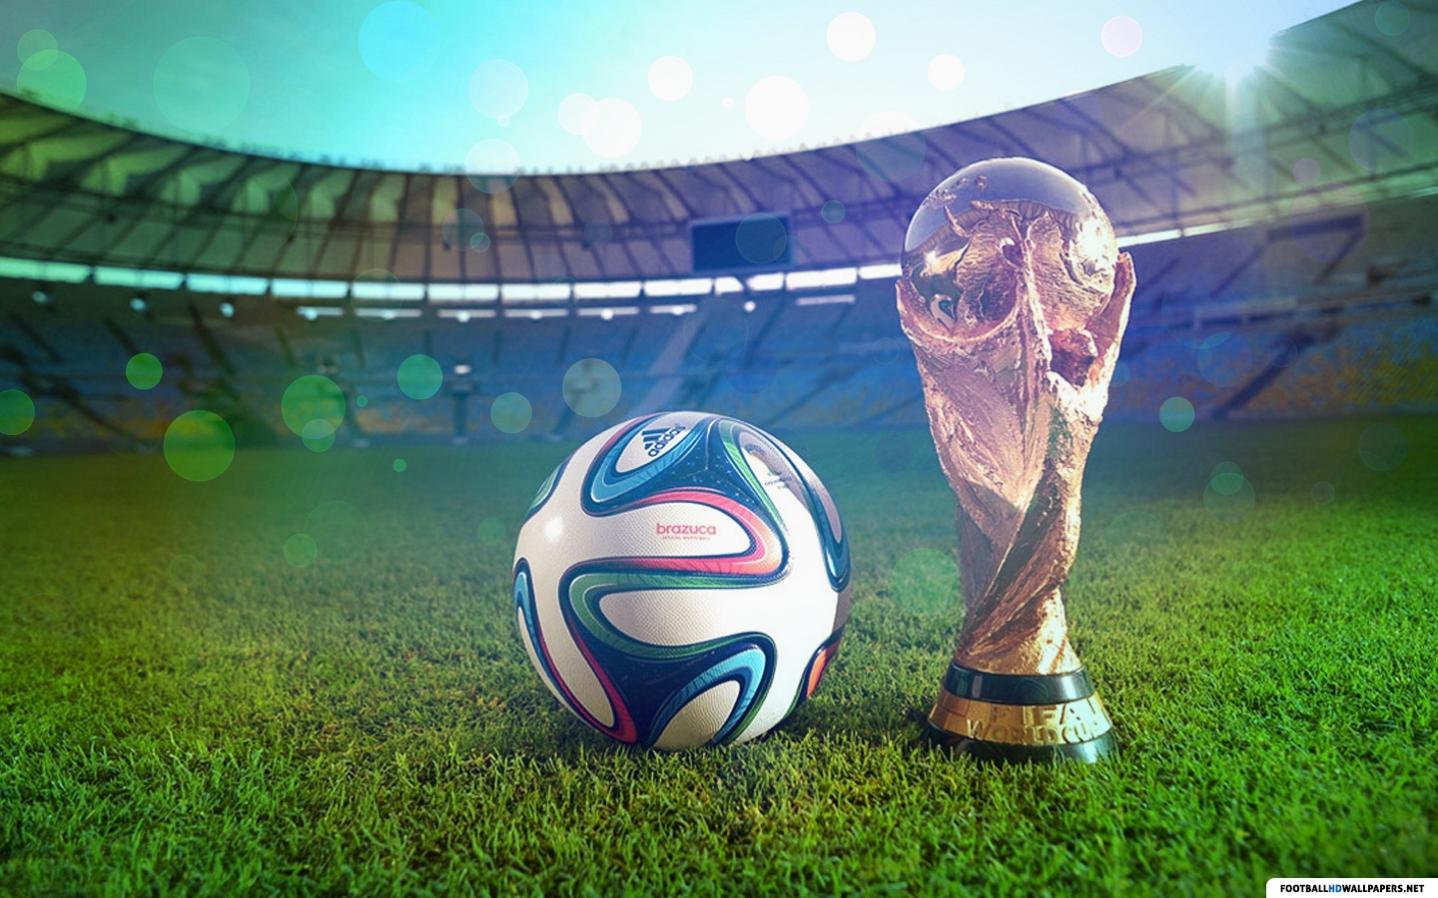 Football Wallpapers Hd   Football Hd Wallpapers 1080p 2416989 1438x898